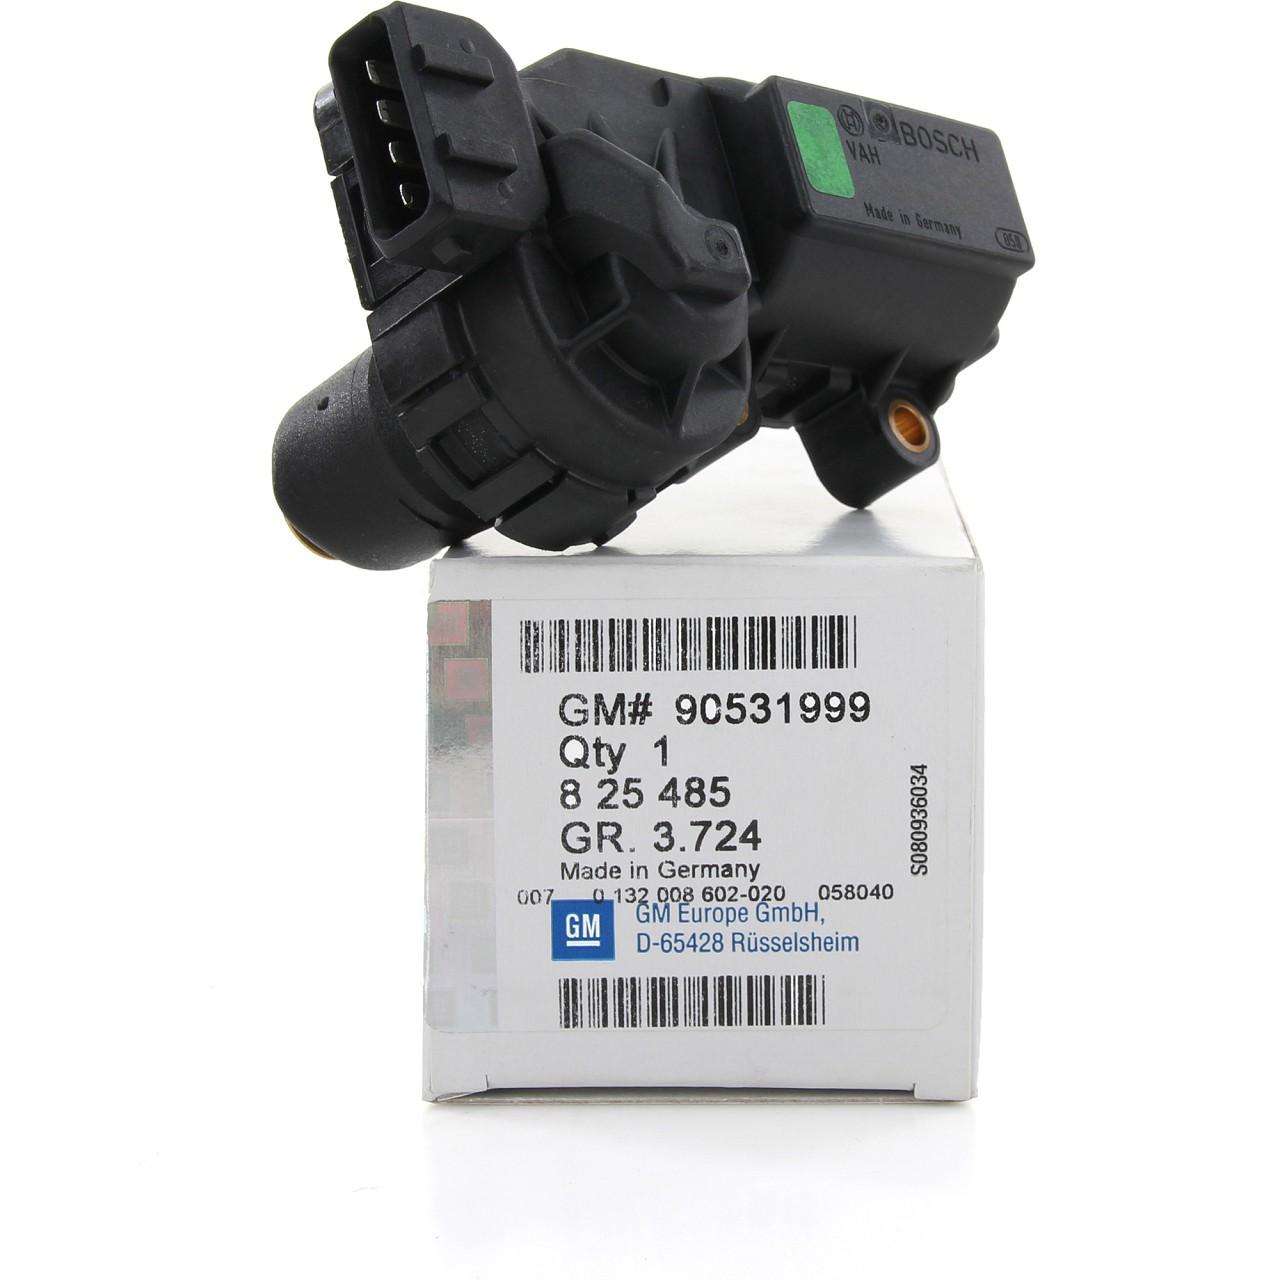 ORIGINAL GM OPEL Leerlaufregler Leerlaufventil ASTRA G CORSA B 1.2i 16V 825485